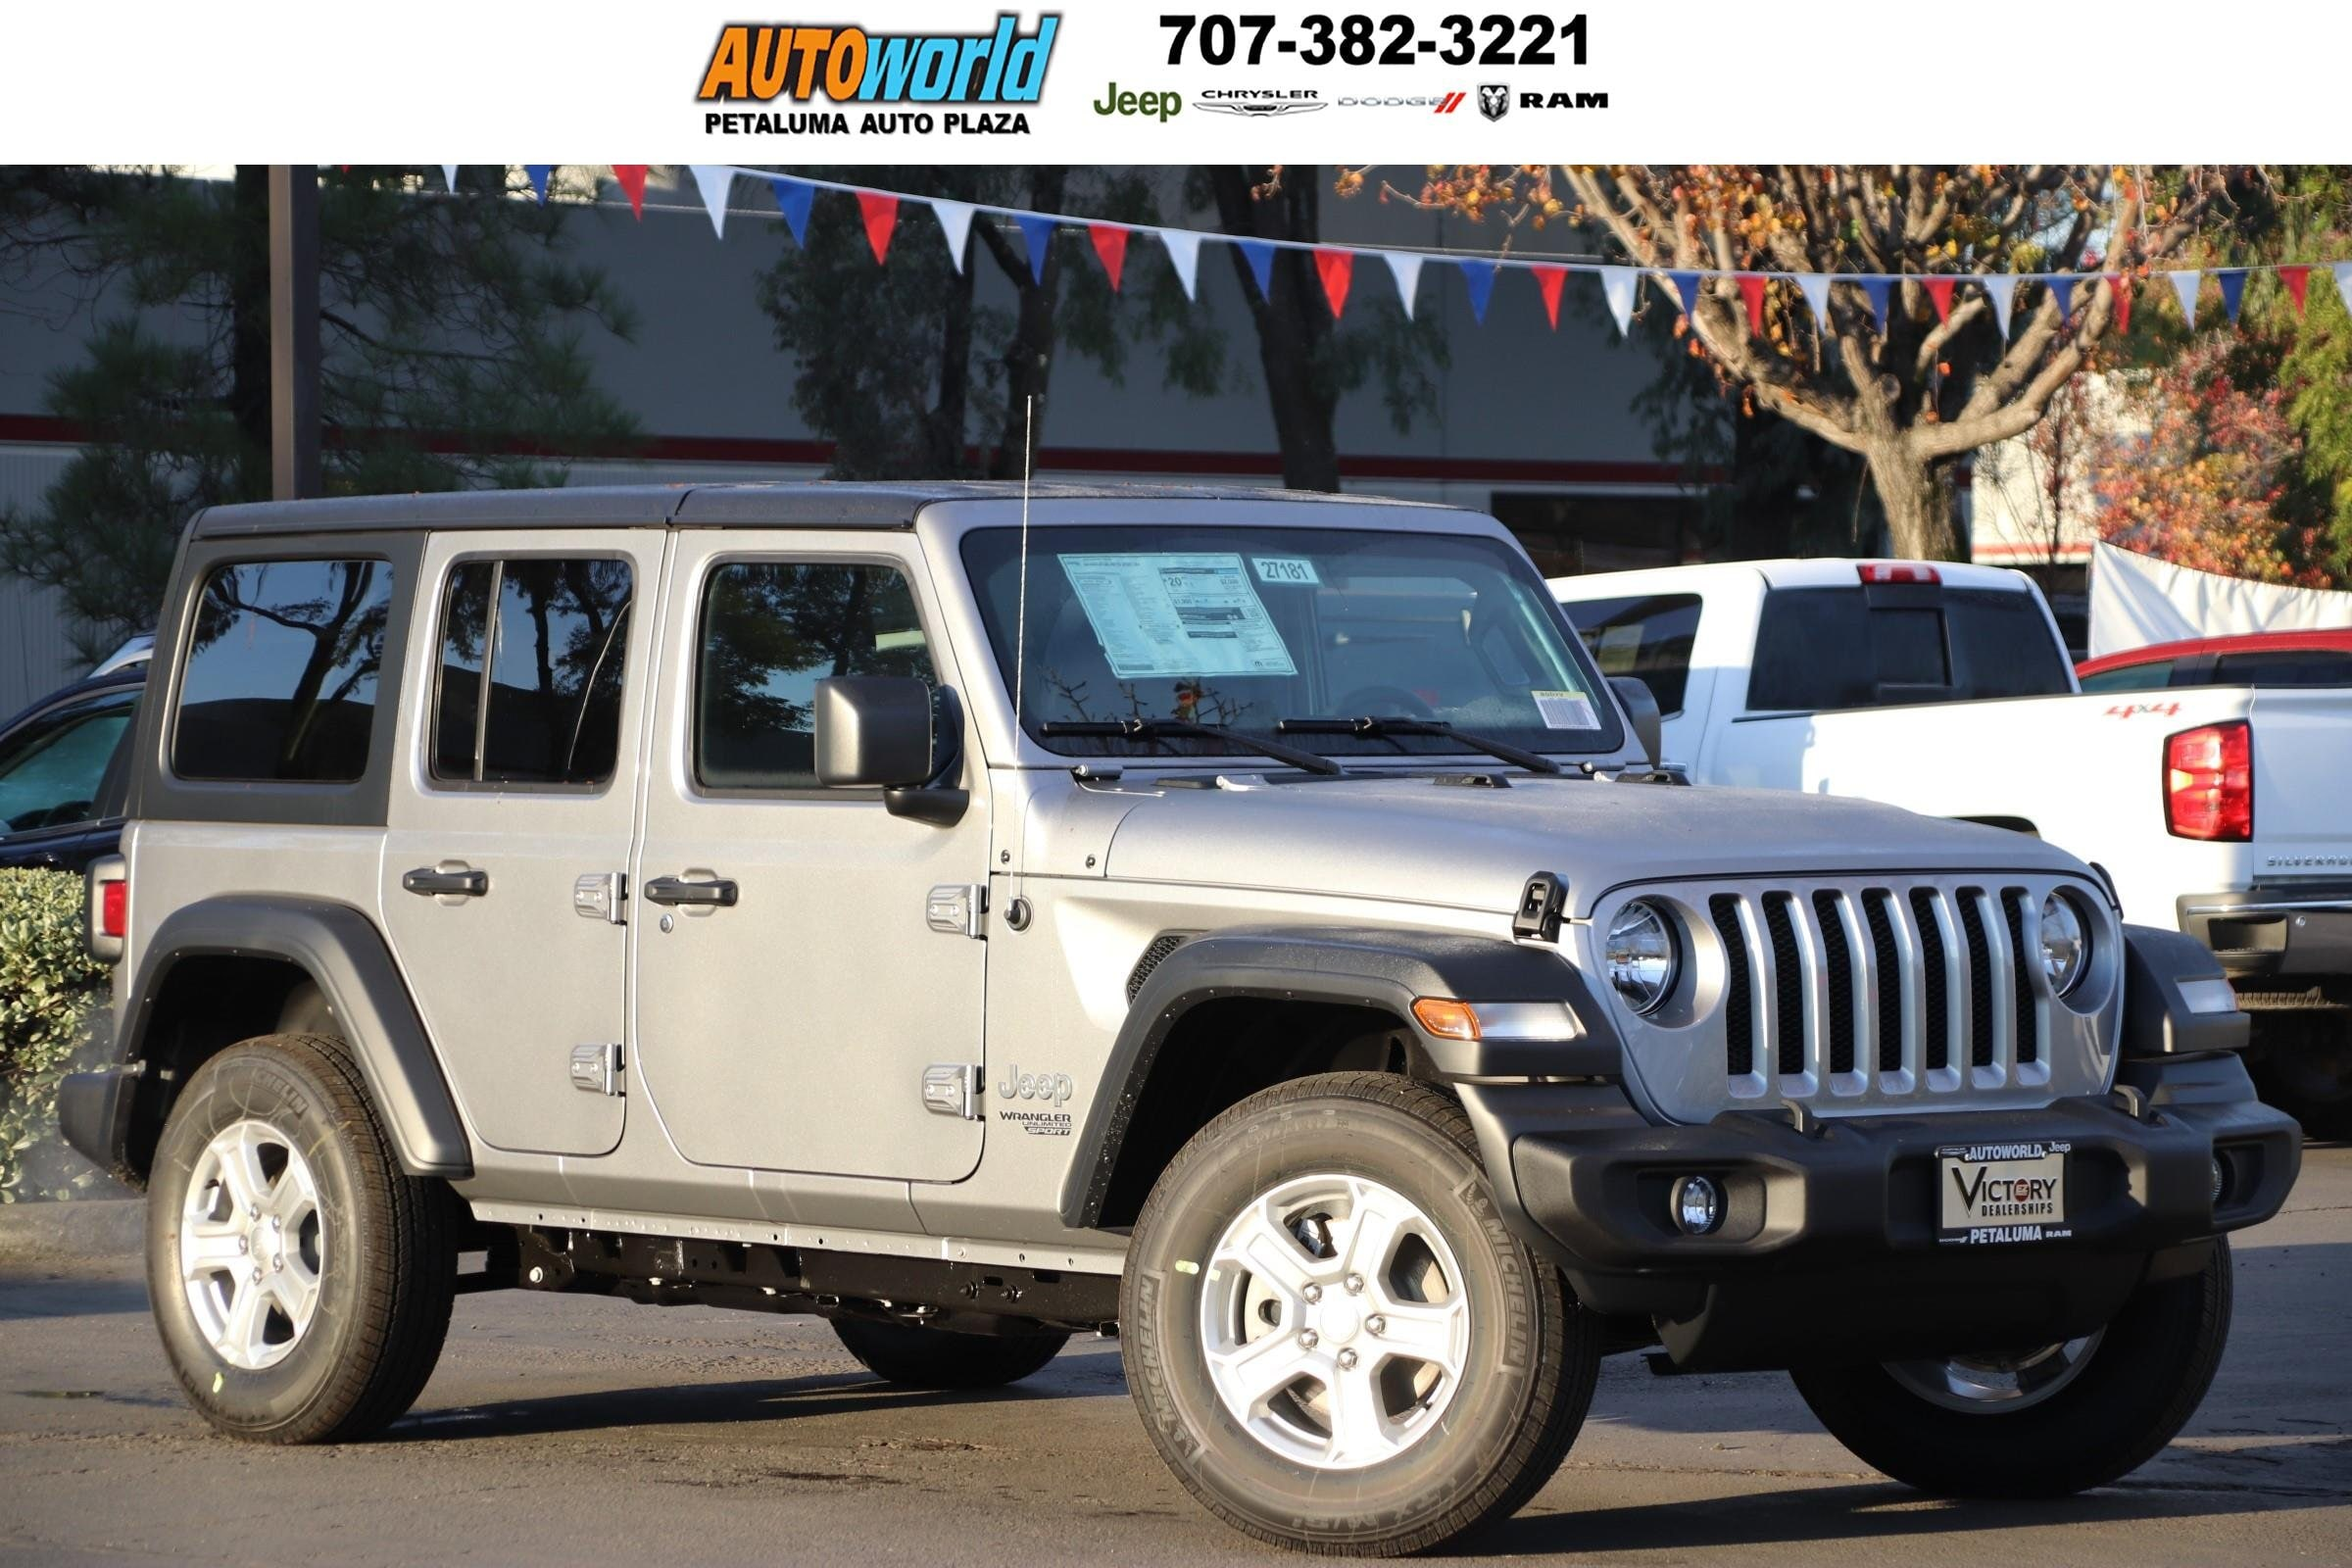 2019 Jeep Wrangler UNLIMITED SPORT S 4X4 Sport Utility 27181